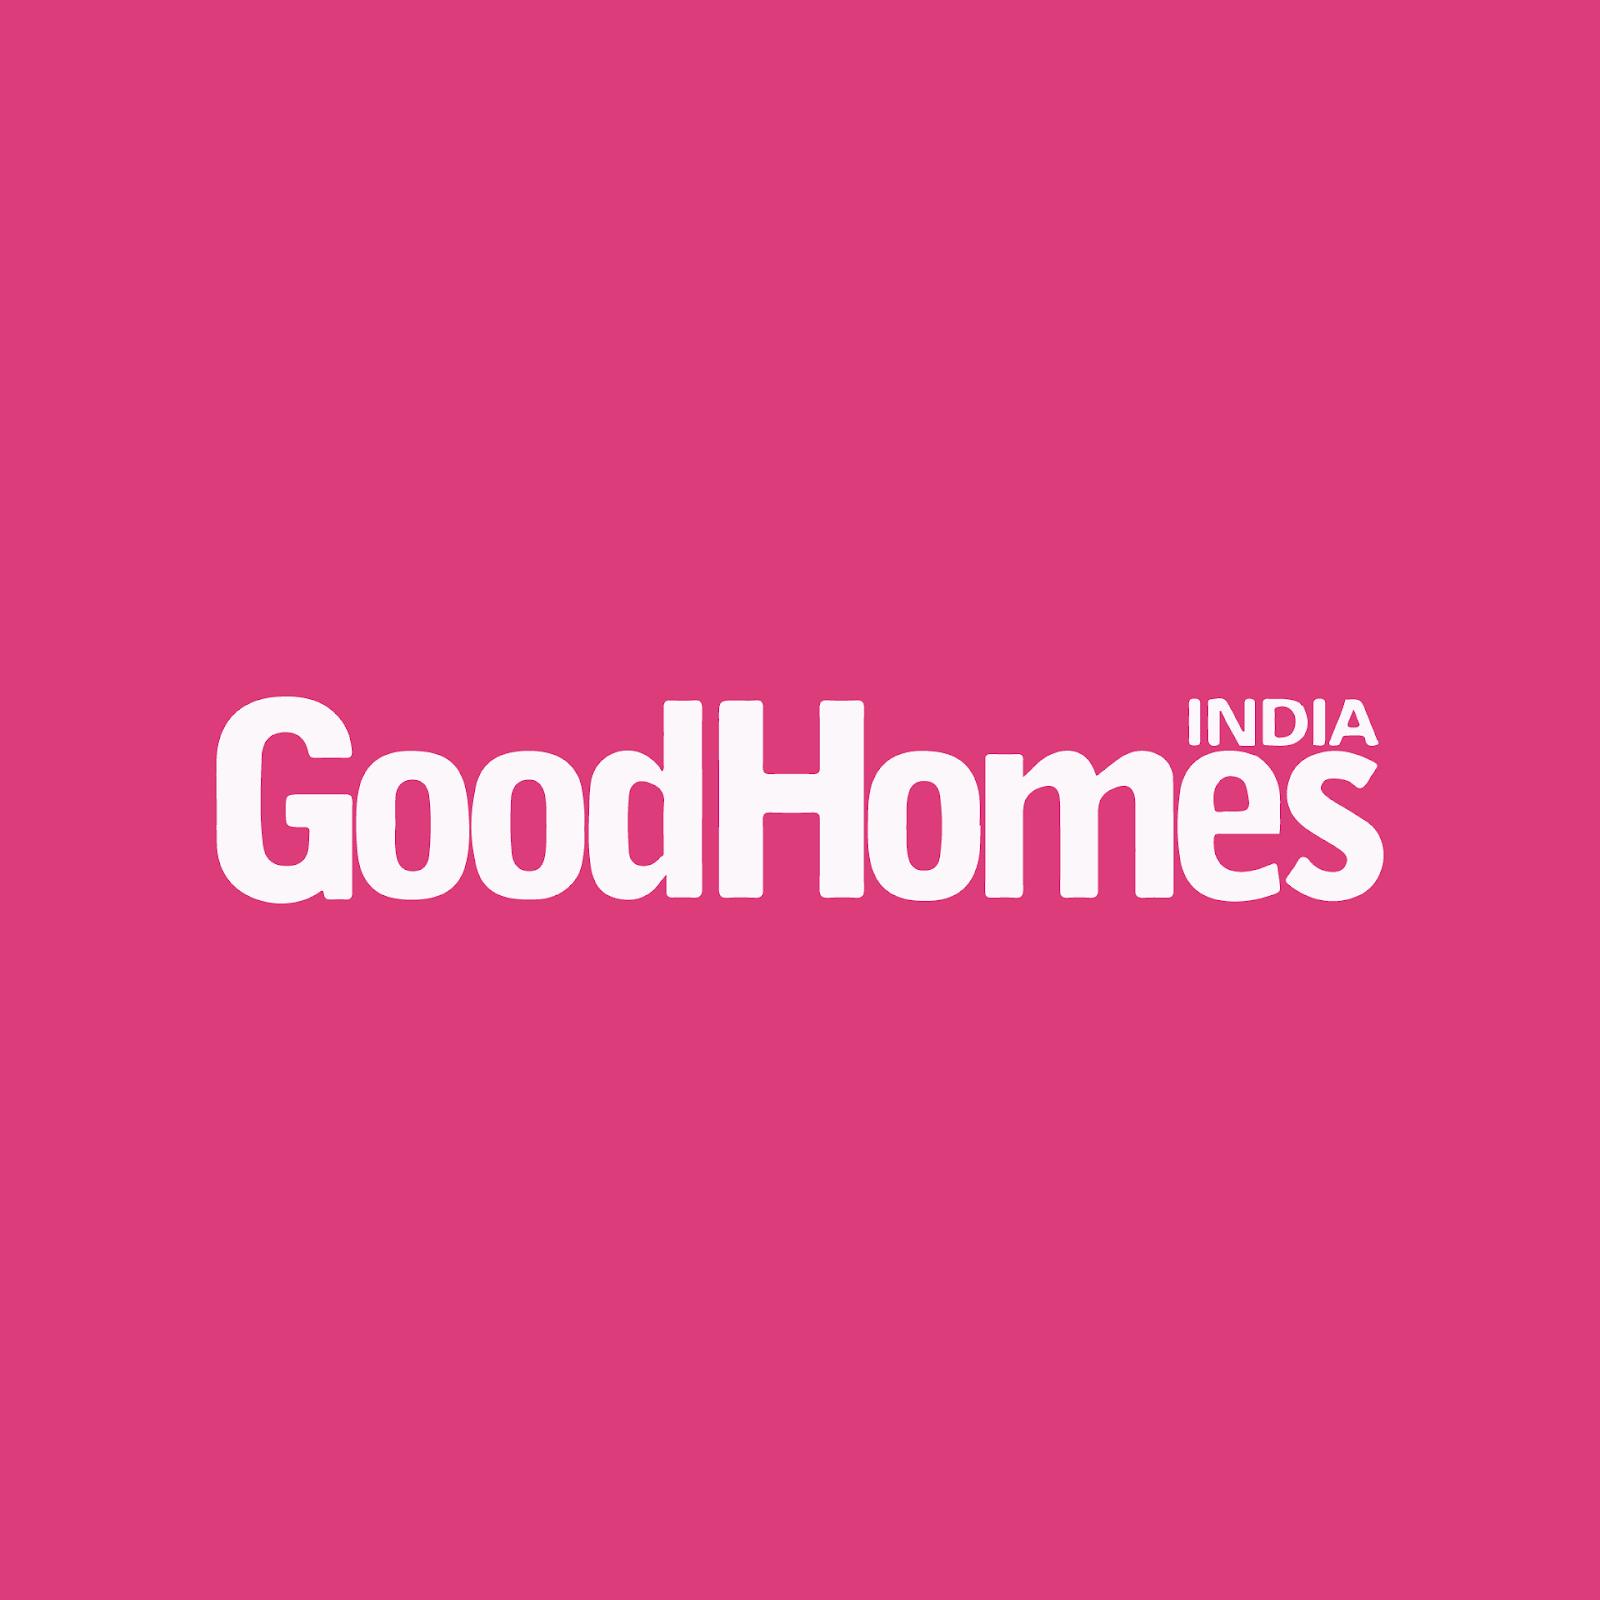 Good Homes Gift Voucher in Xoxoday Plum